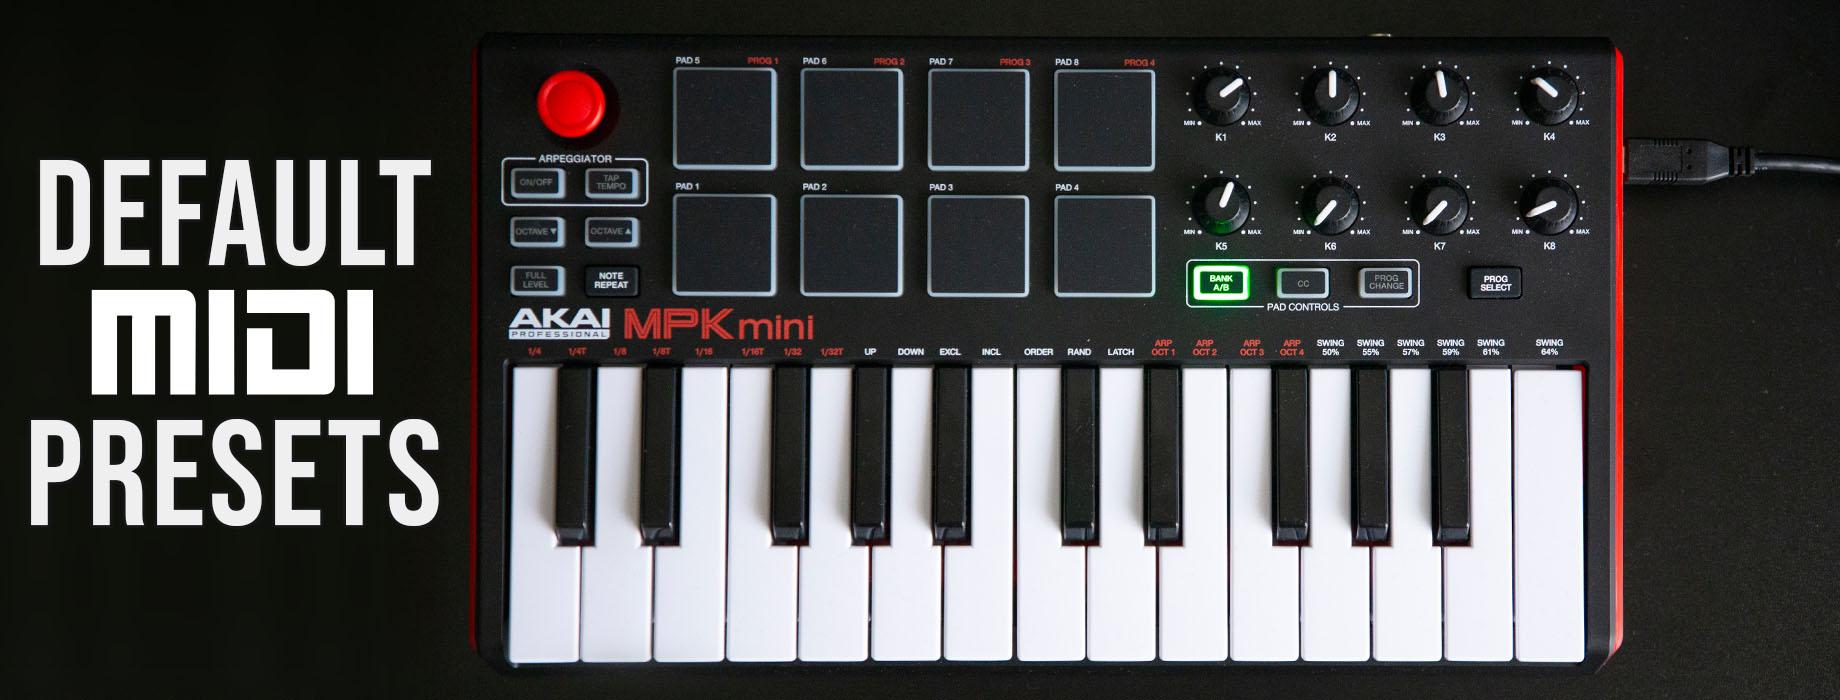 AKAI MPK Mini MkII Factory Default Presets